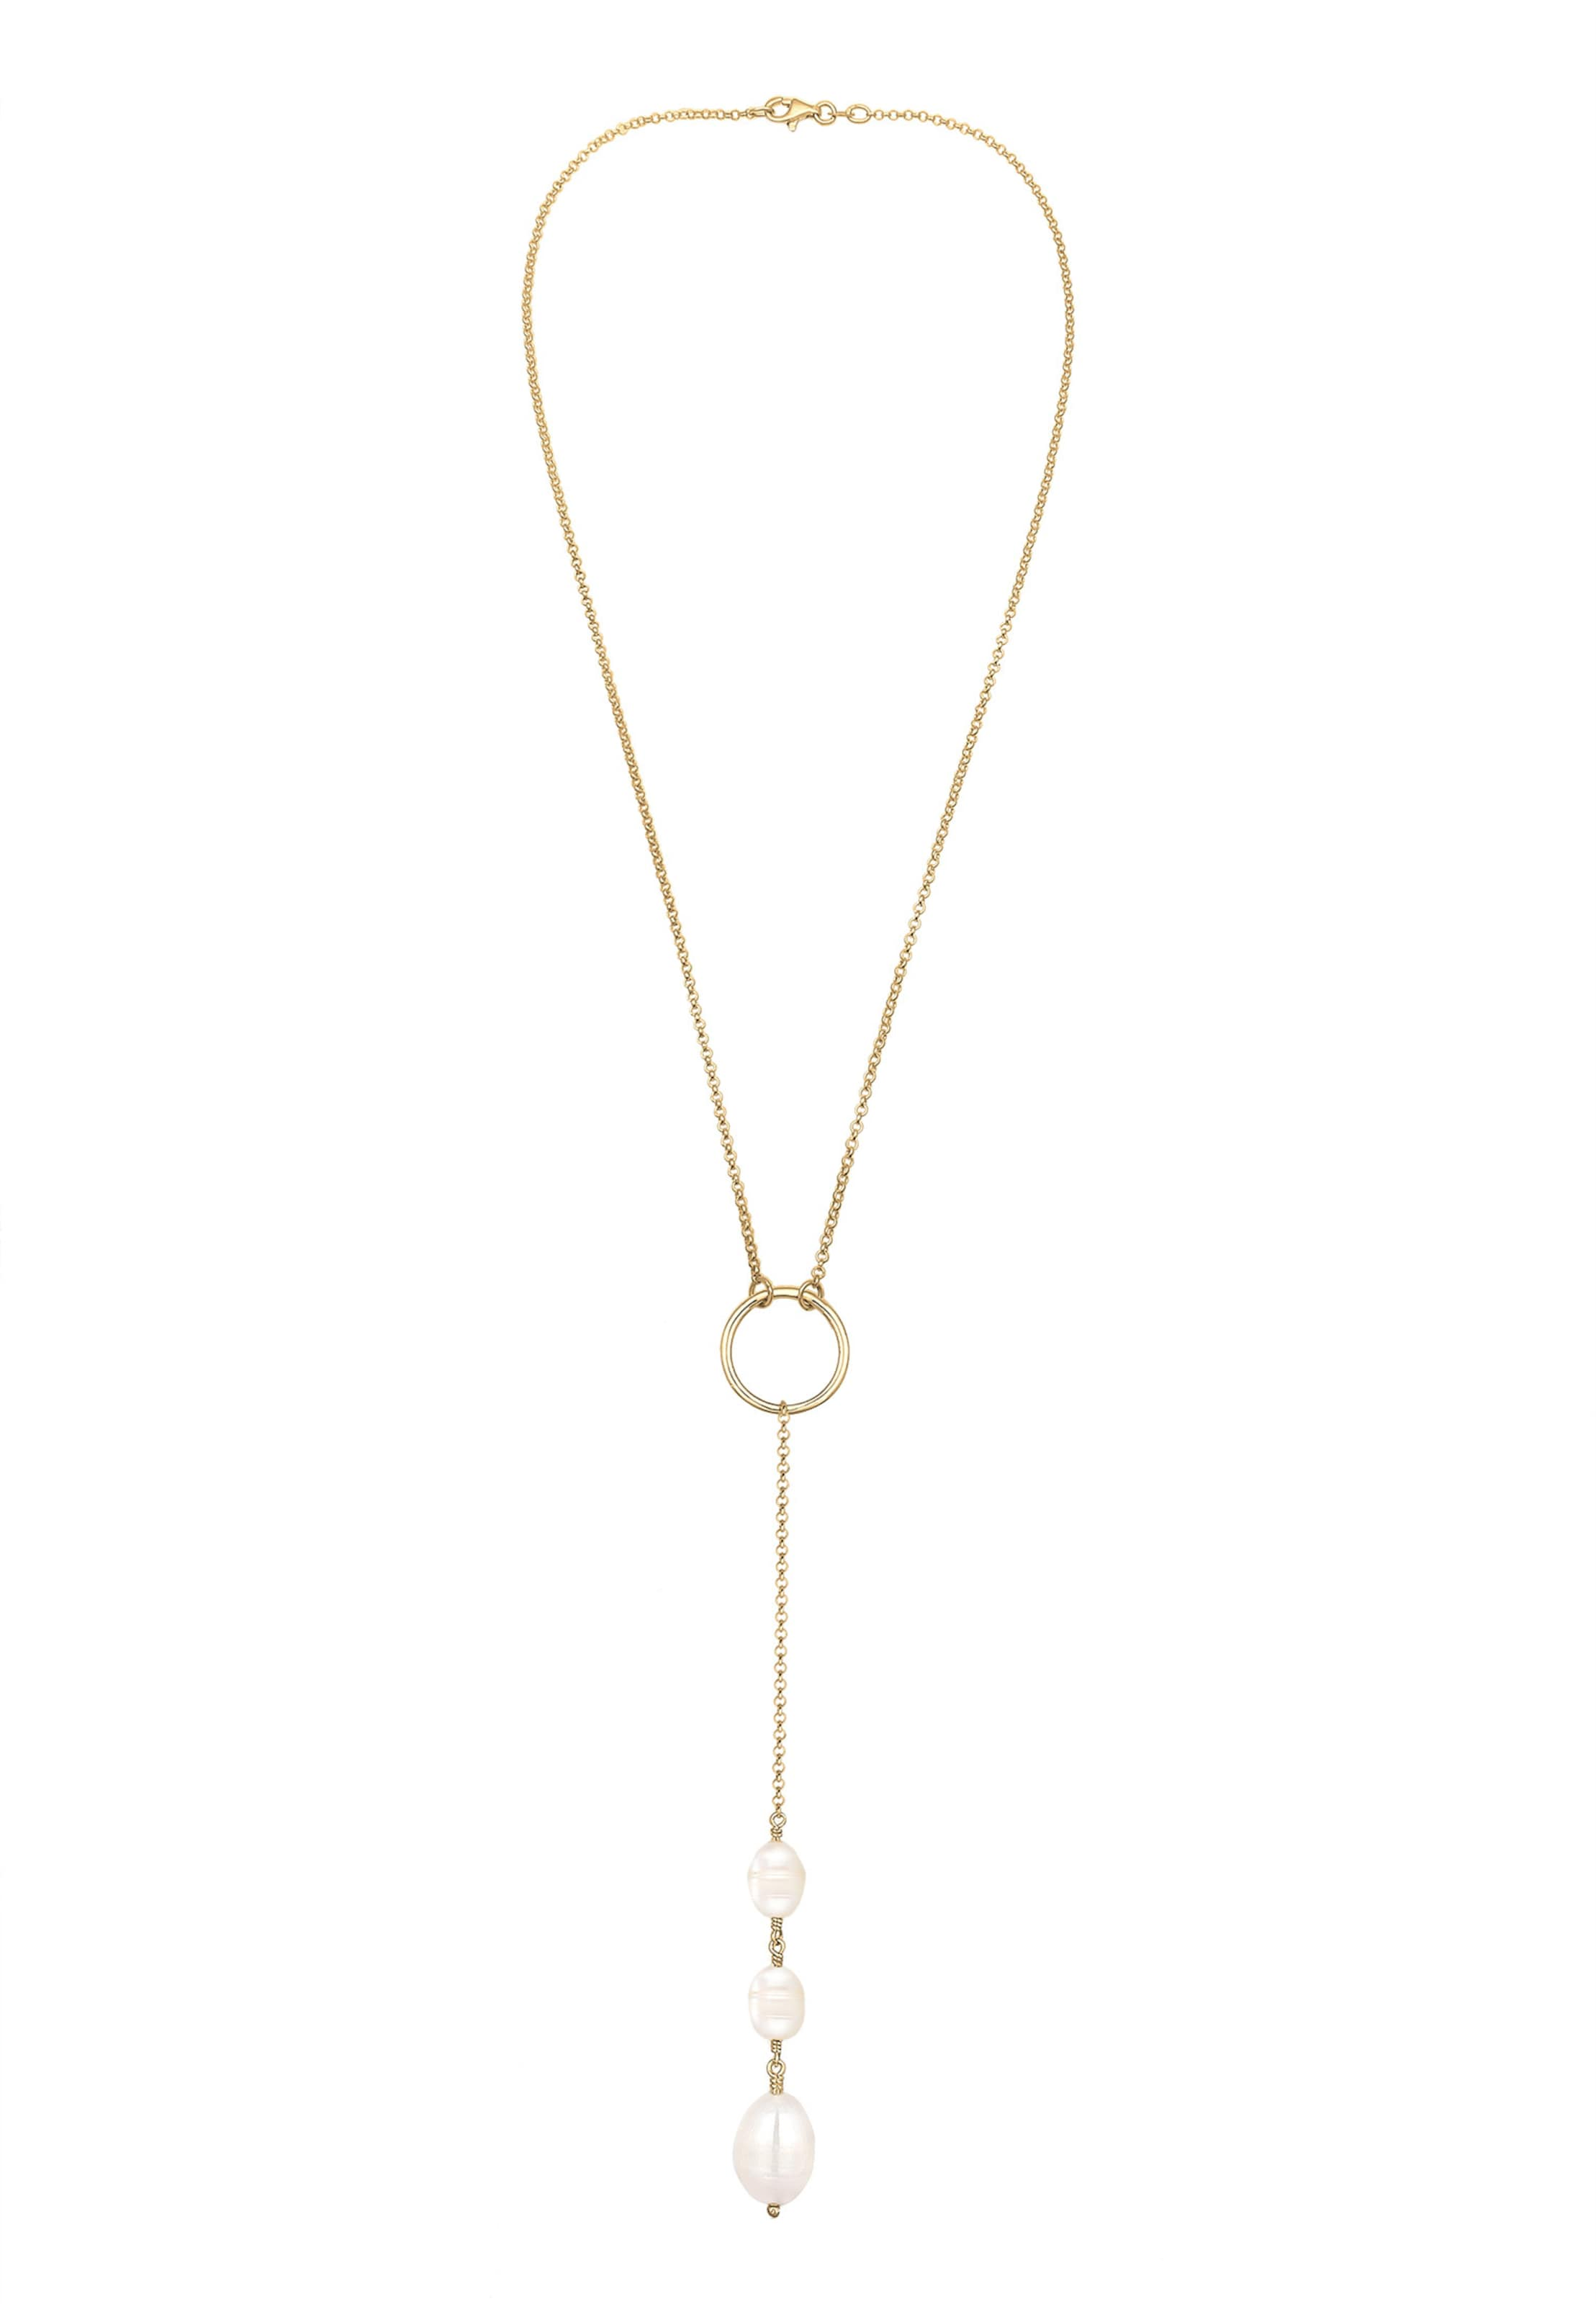 'kreis' 'kreis' In Elli Halskette Elli In 'kreis' GoldPerlweiß Elli Halskette GoldPerlweiß Halskette LqGSVUzMp